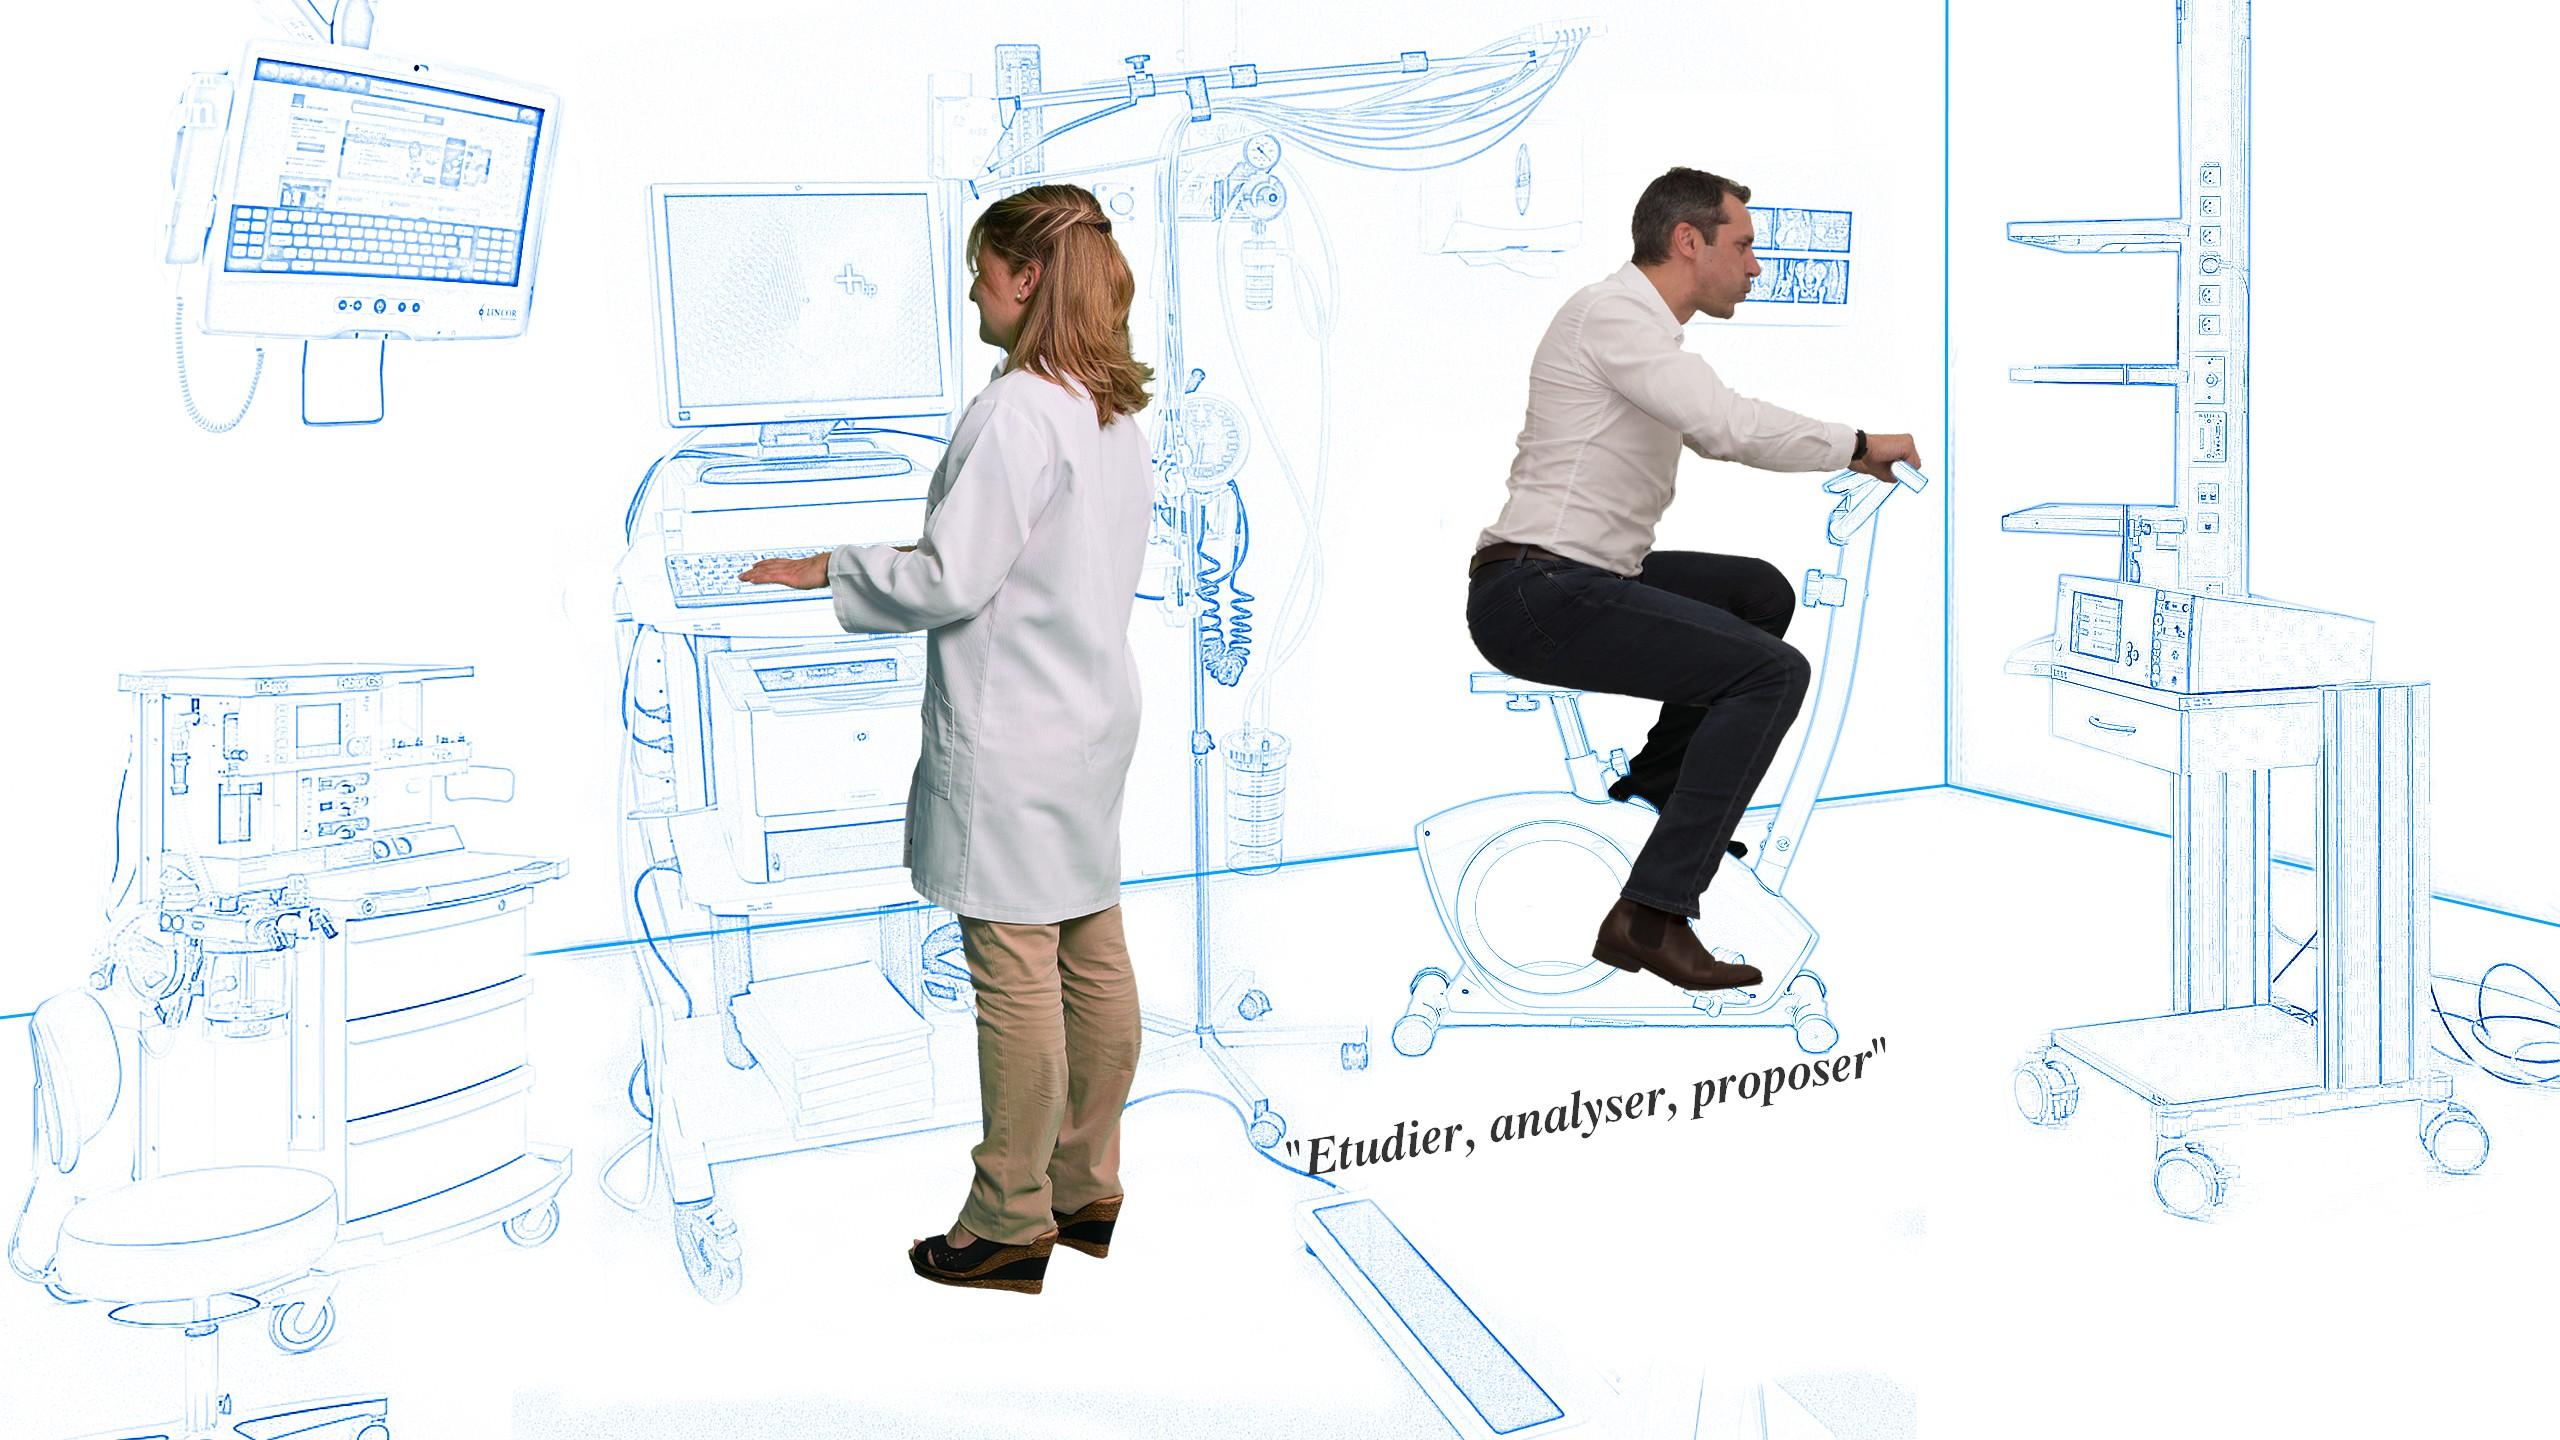 R&D : étudier analyser proposer